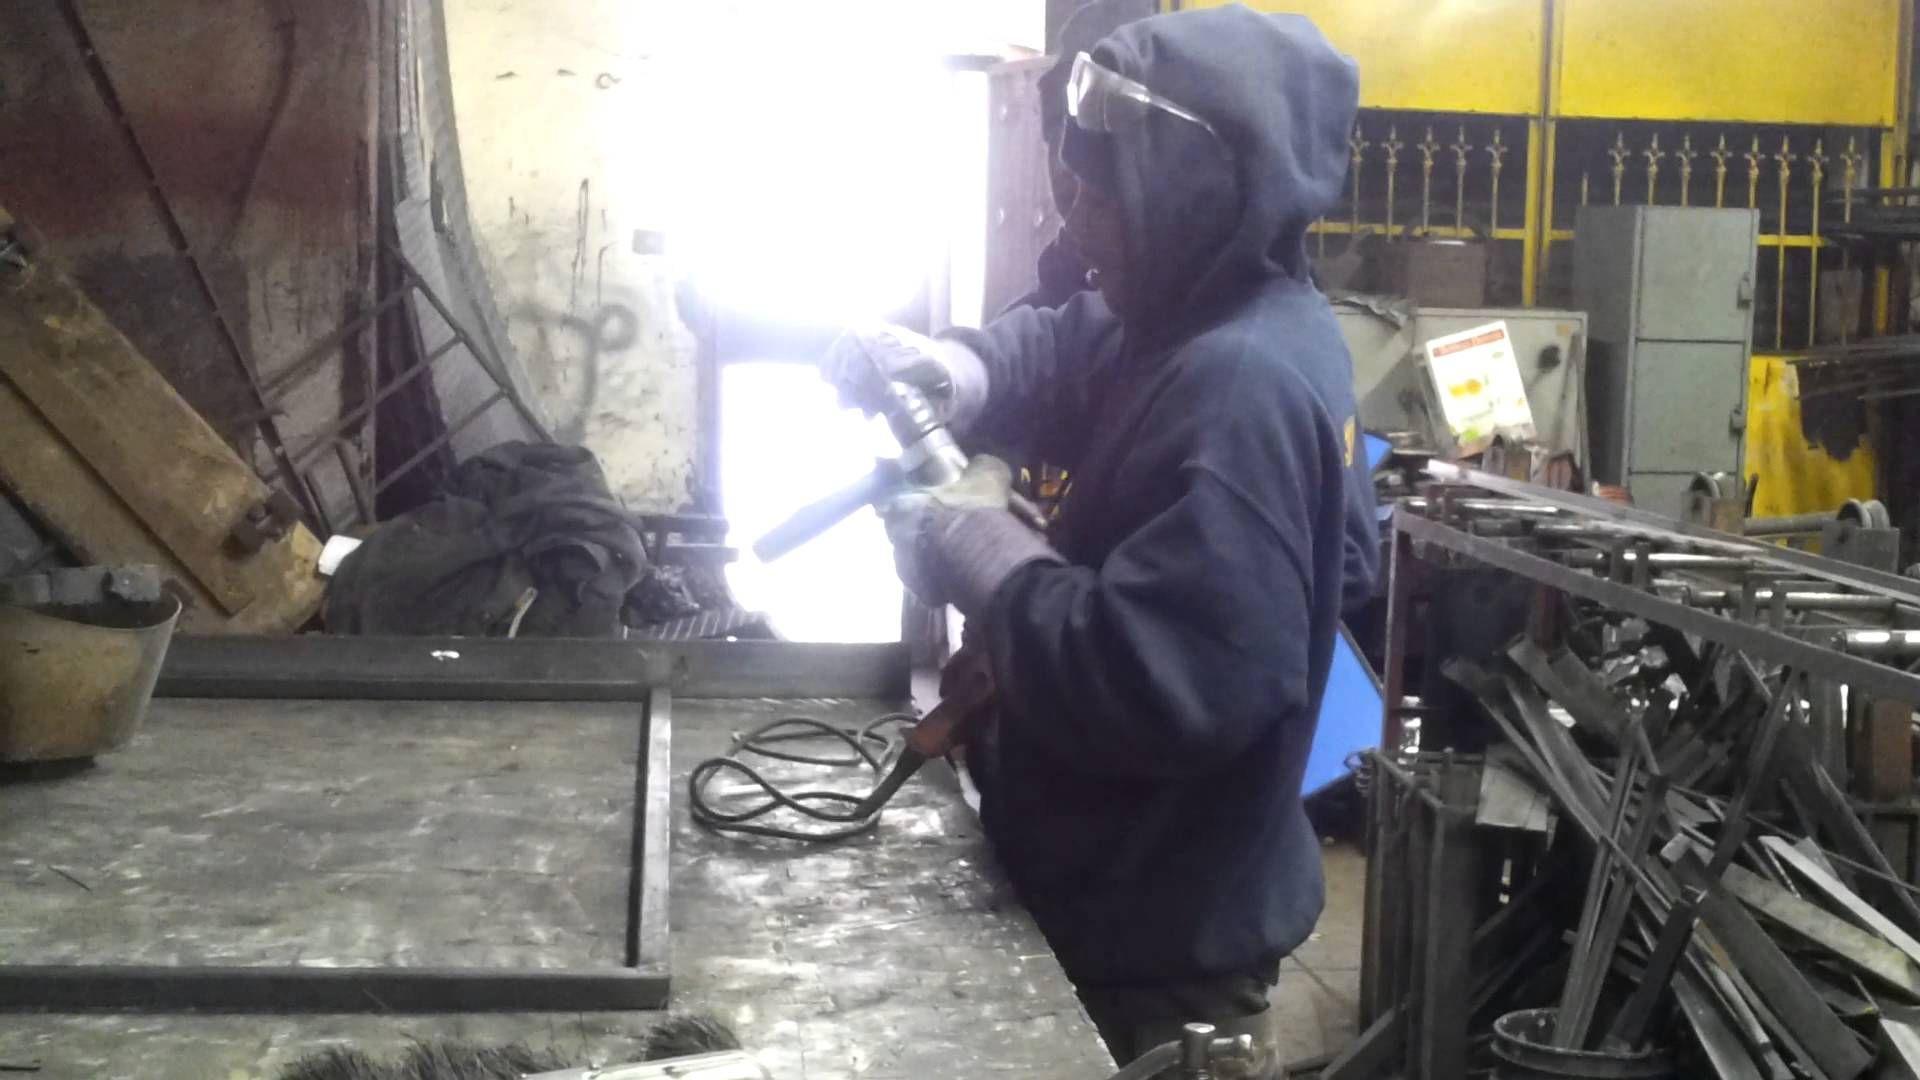 Our welder is teaching how to interchange drill bits.  #ironworkrepairs